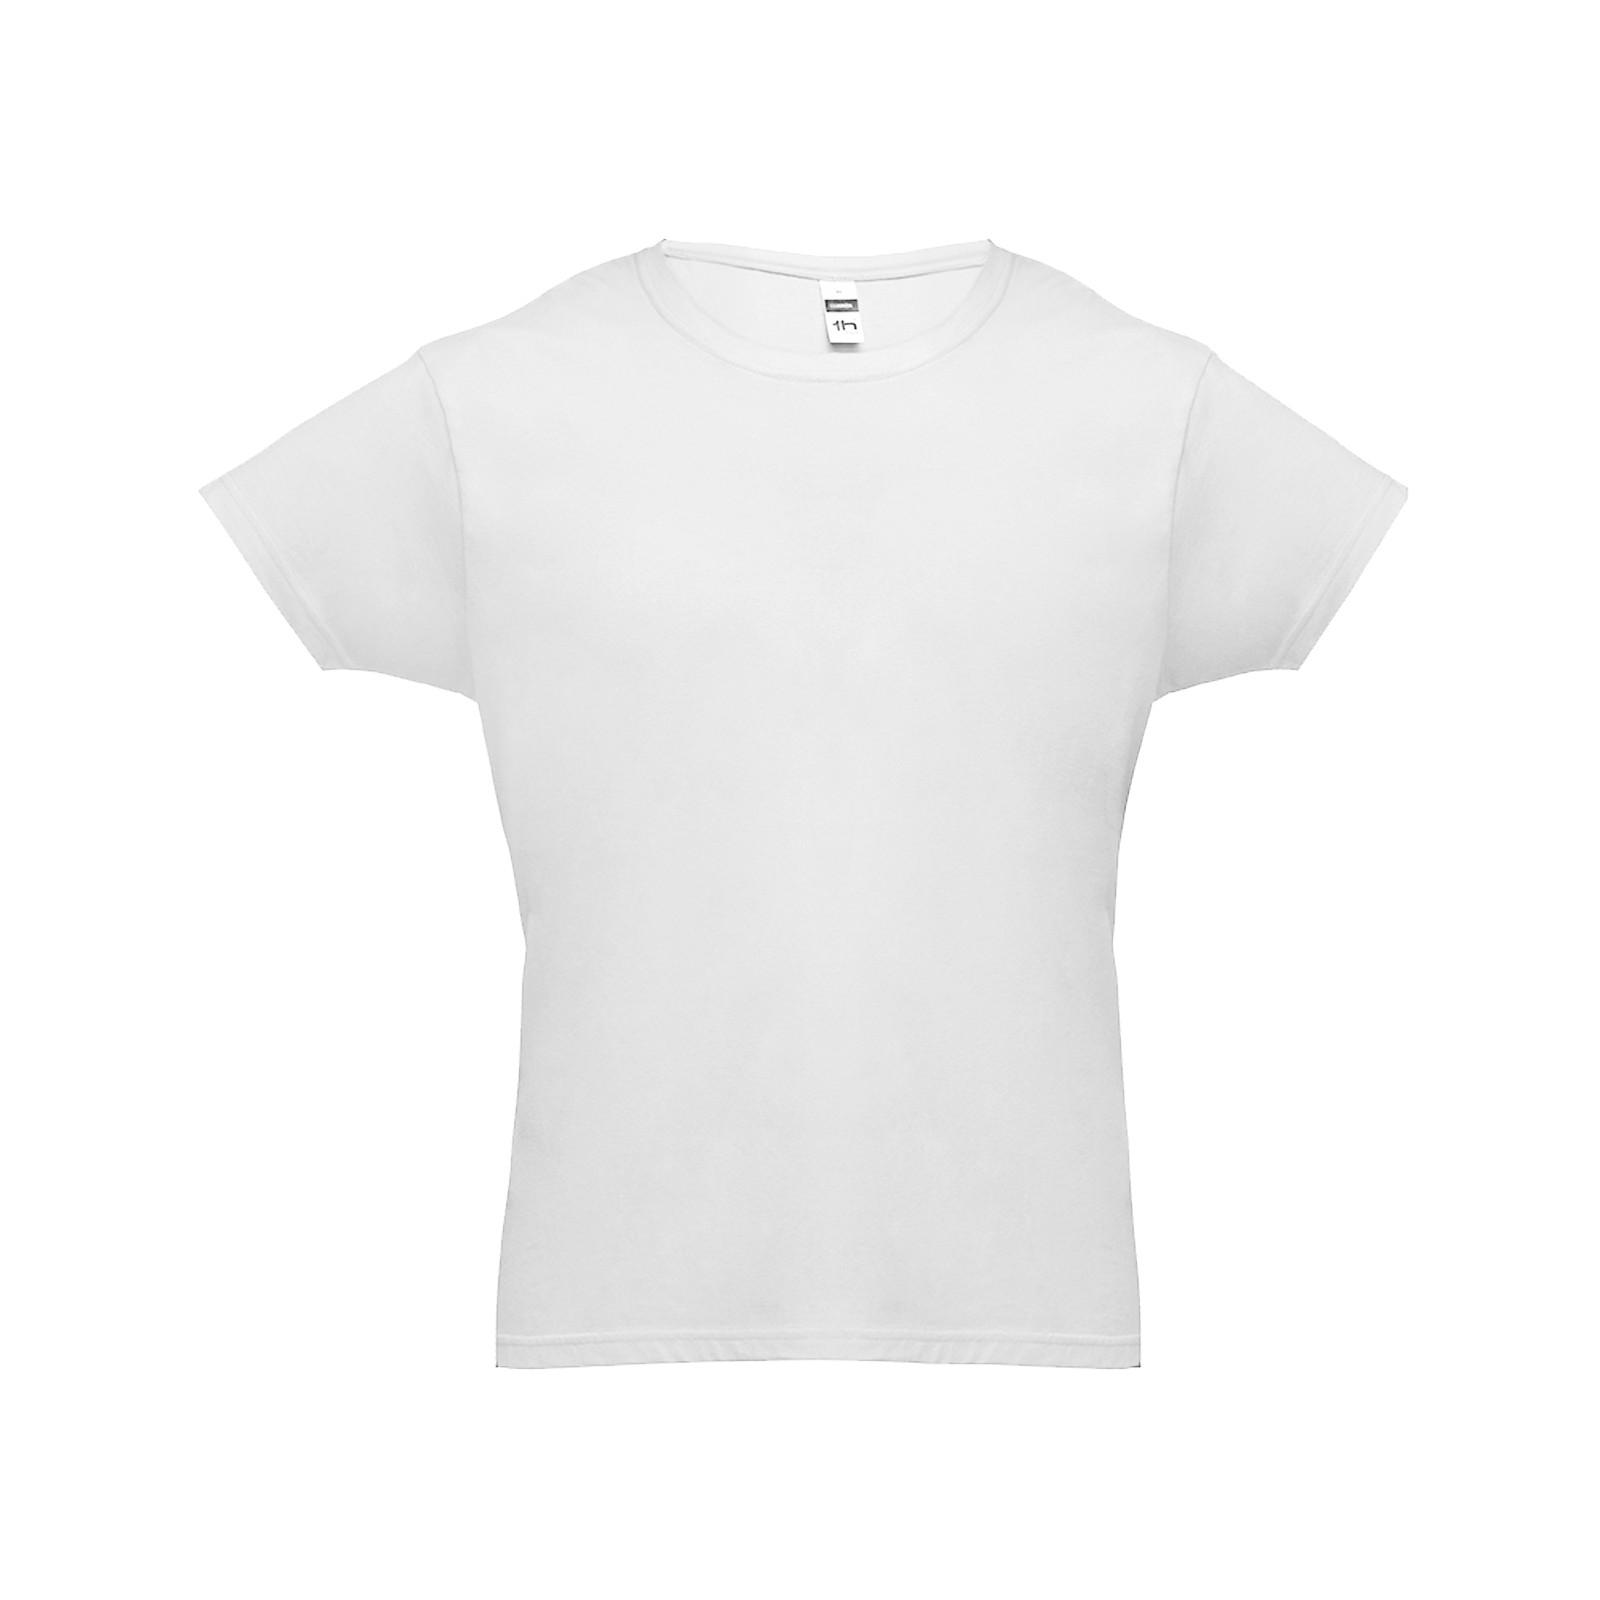 THC LUANDA WH. Pánské tričko - Bílá / XS